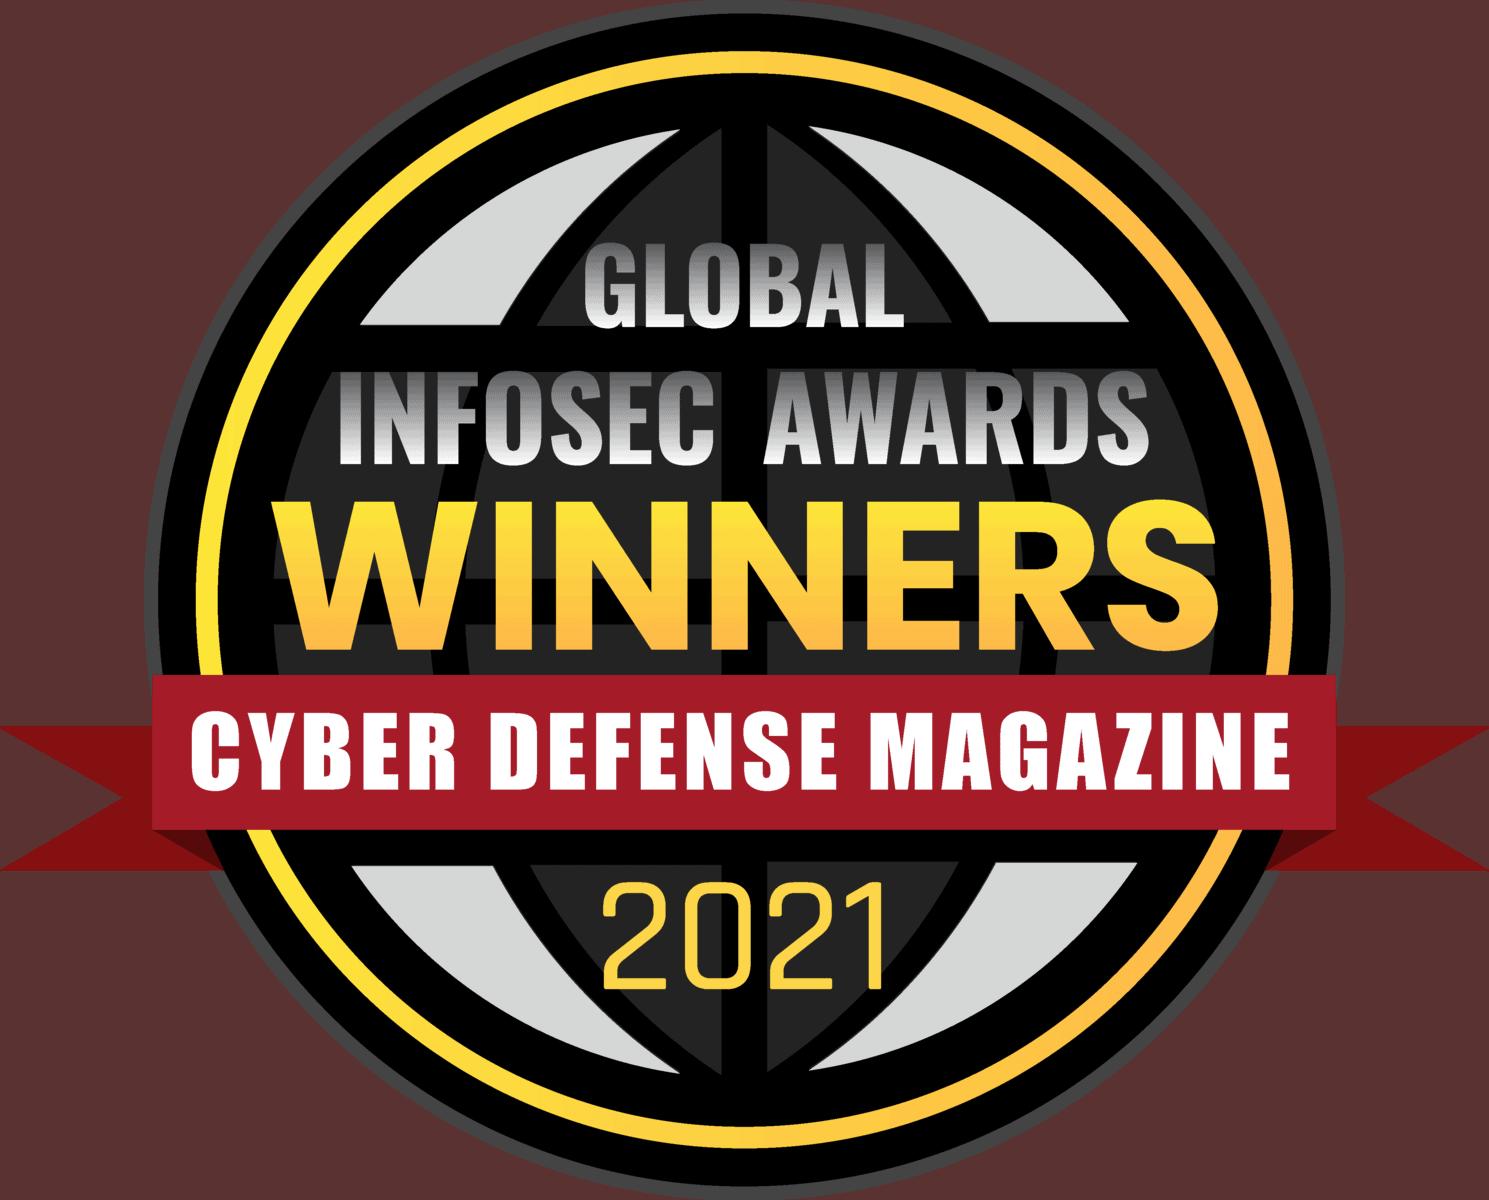 Infosec Winner Badge 2021